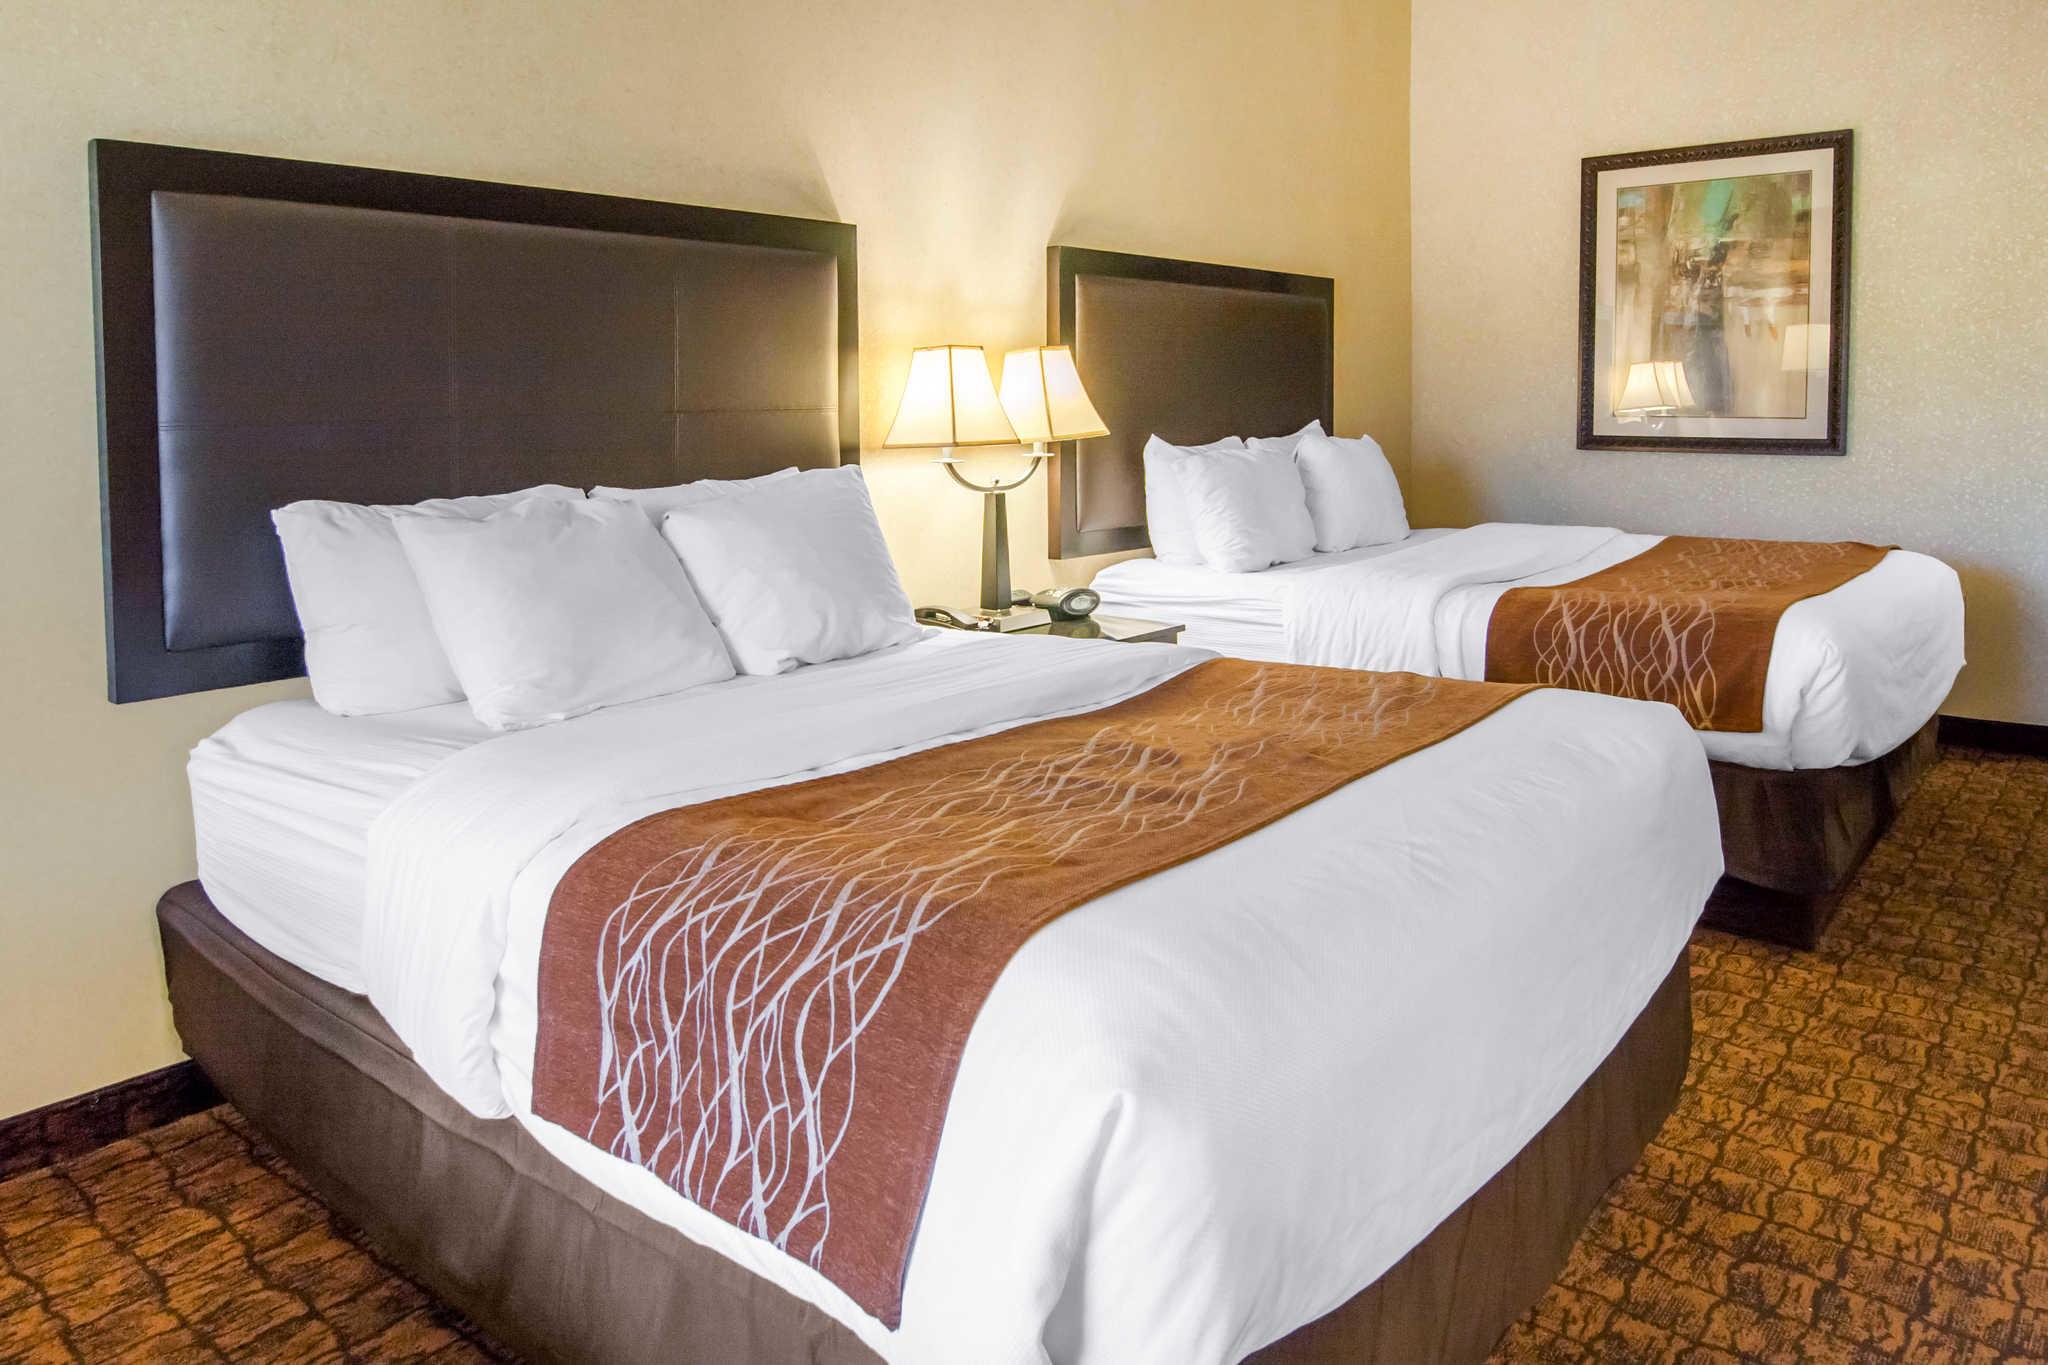 Comfort Inn & Suites image 13